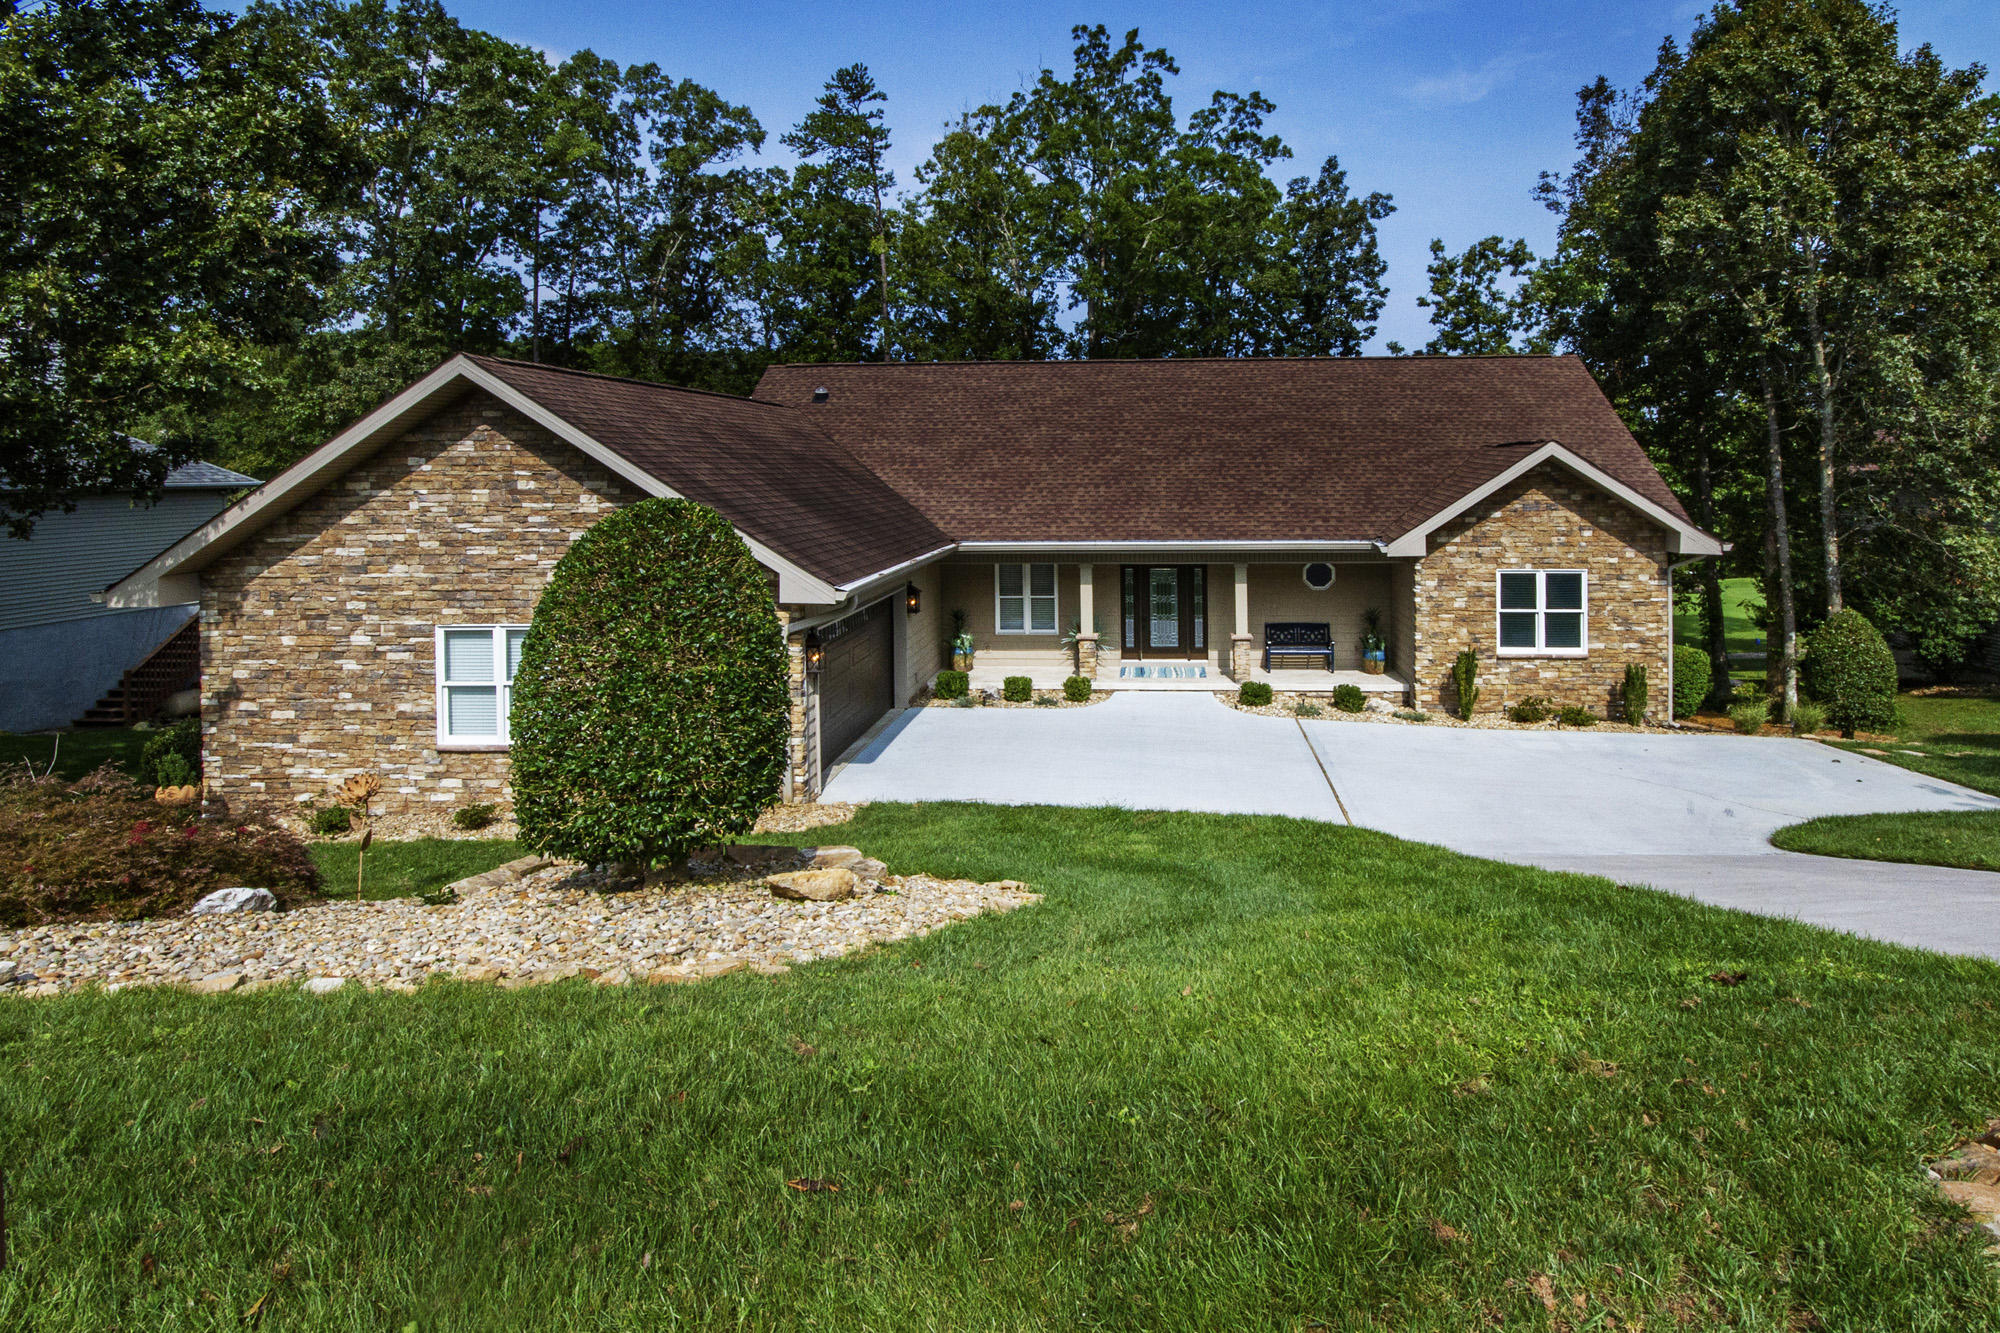 113 Kenosha, Loudon, Tennessee, United States 37774, 3 Bedrooms Bedrooms, ,3 BathroomsBathrooms,Single Family,For Sale,Kenosha,1130257